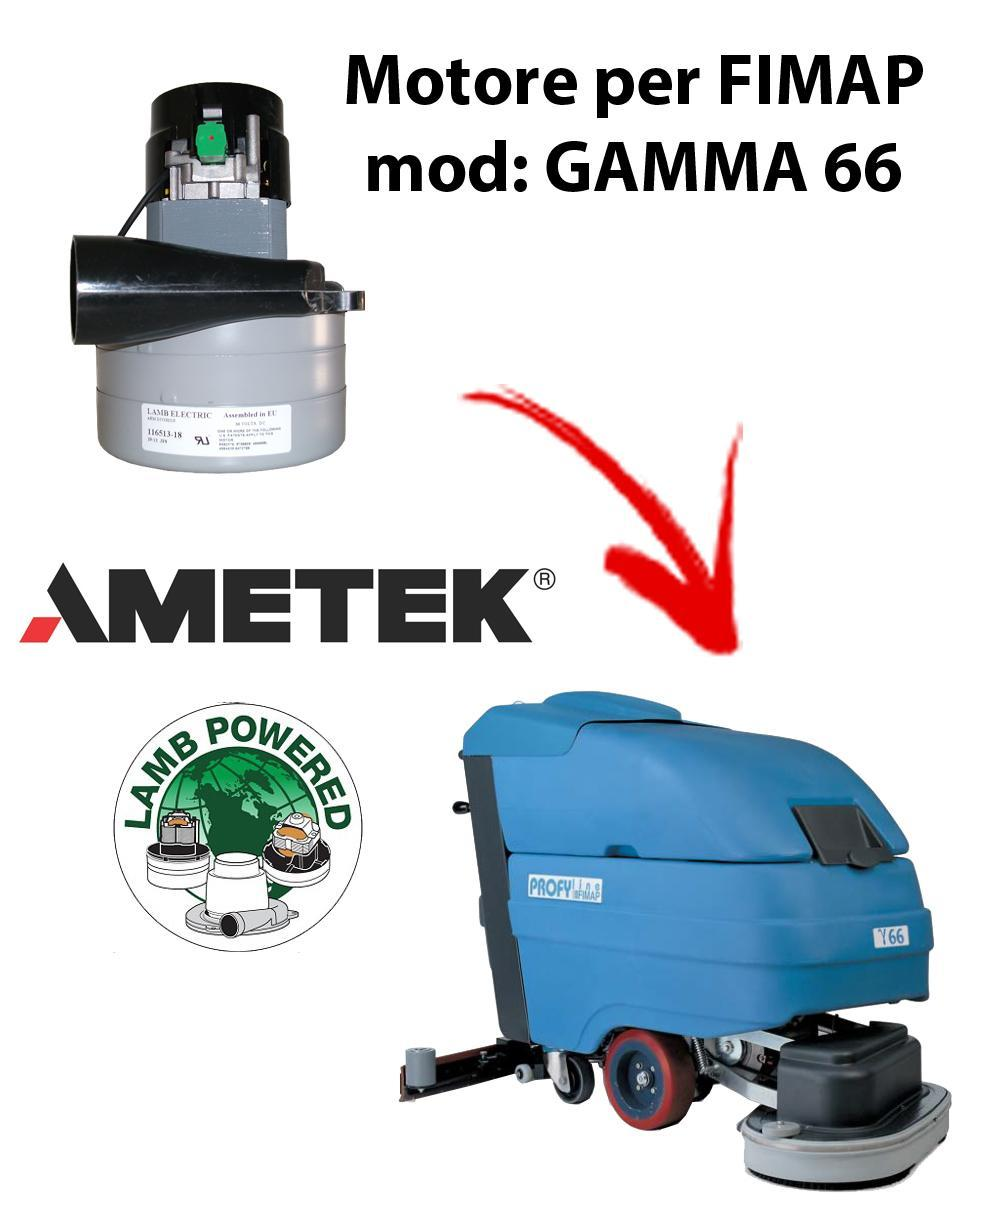 GAMMA 66 Motore de aspiración AMETEK para fregadora FIMAP